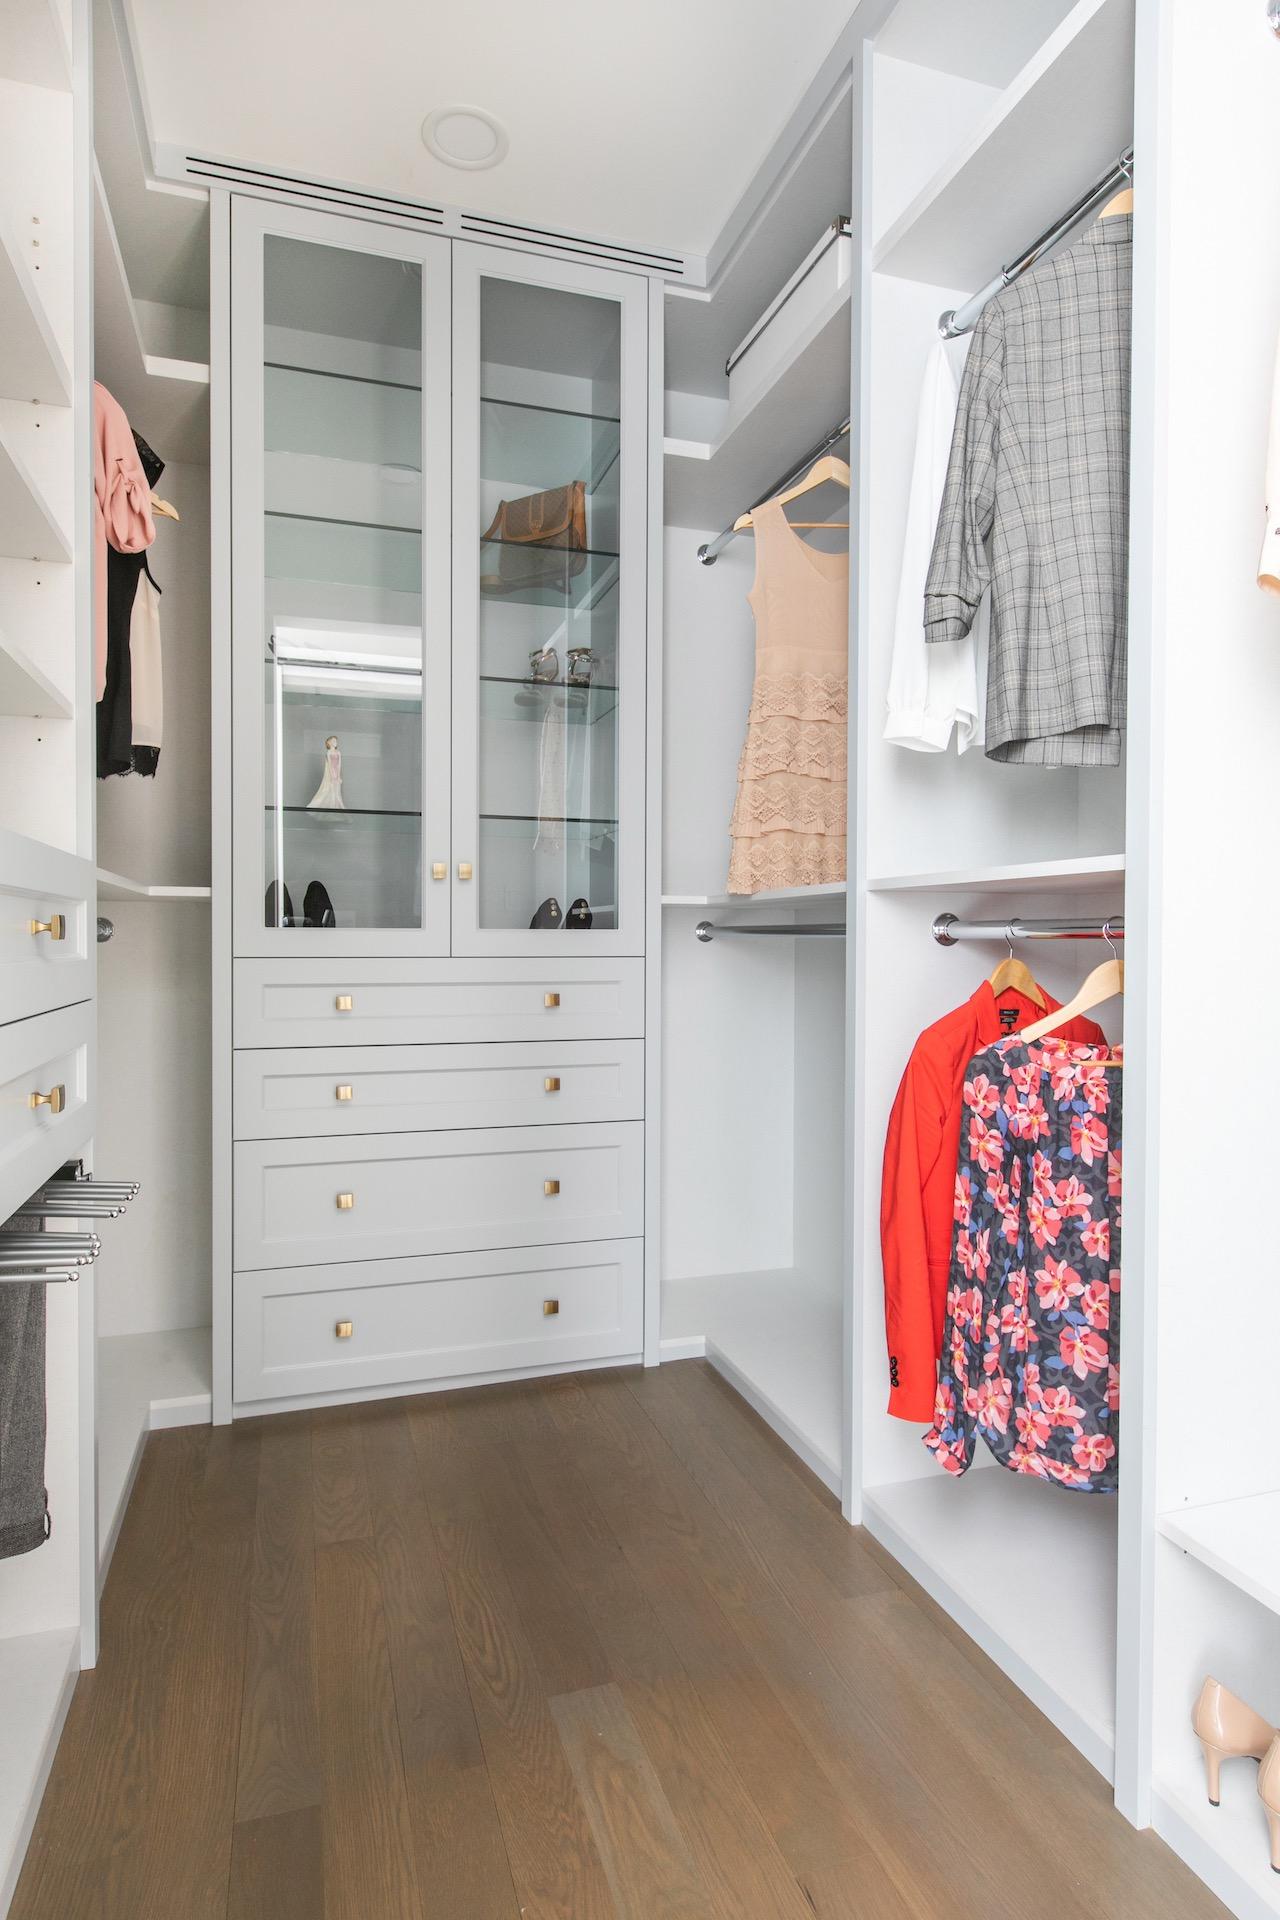 NIICO woman's Wardrobe